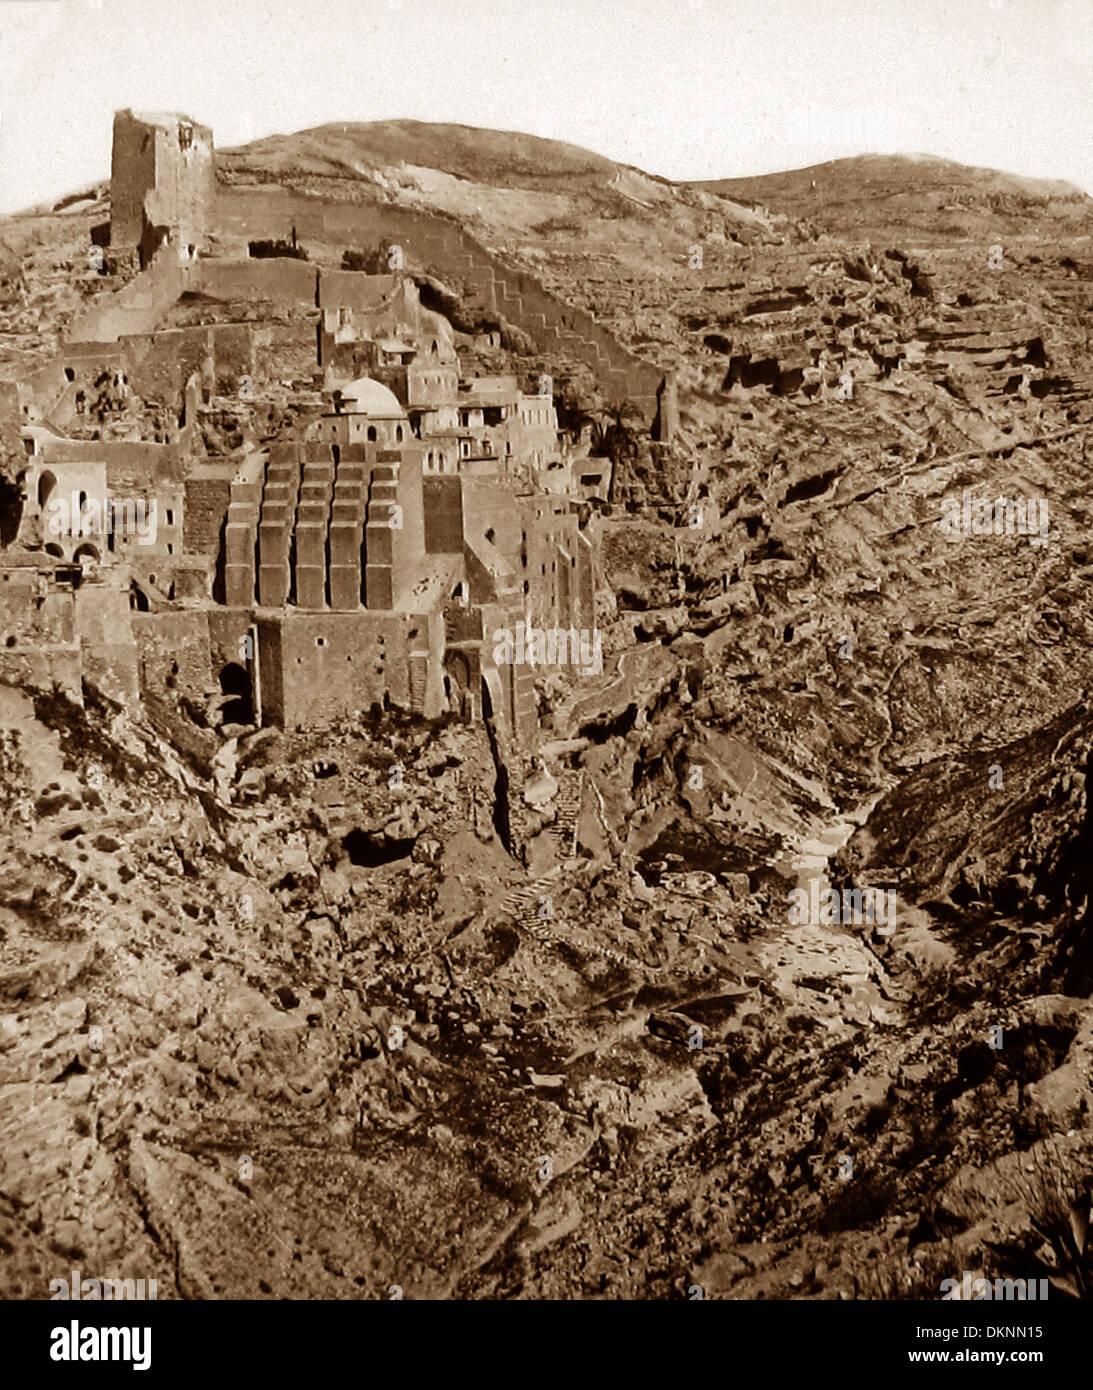 Israel Convent of Mar Saba pre-1900 - Stock Image